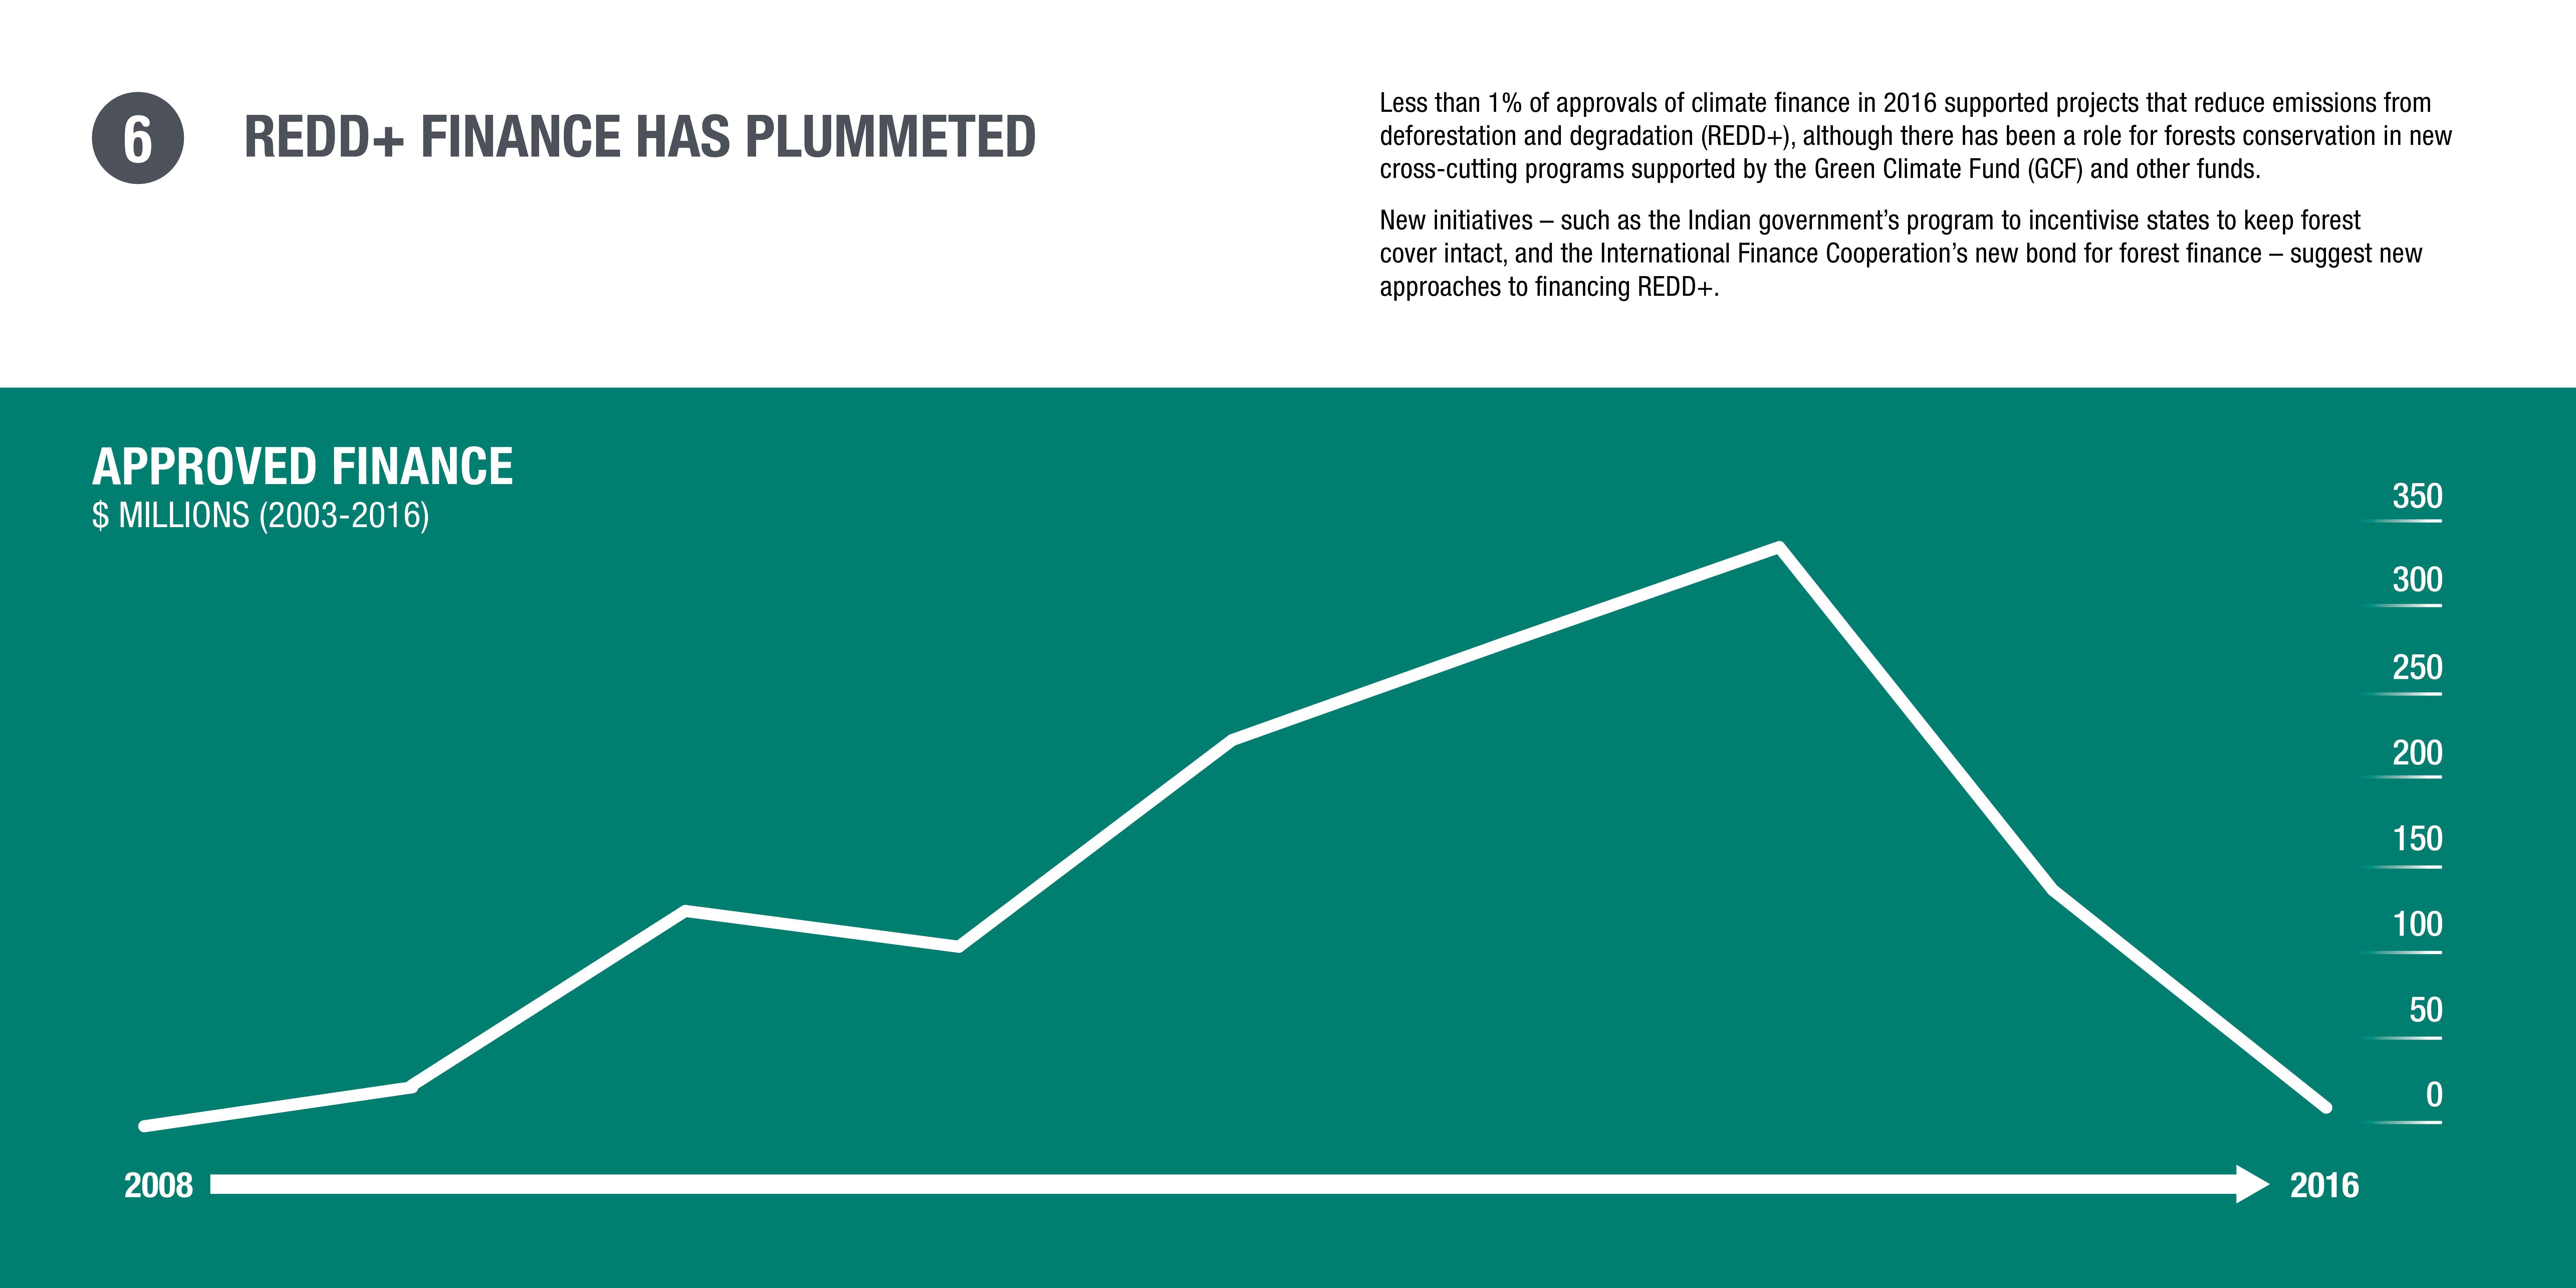 Infographic: REDD+ finance has plummeted